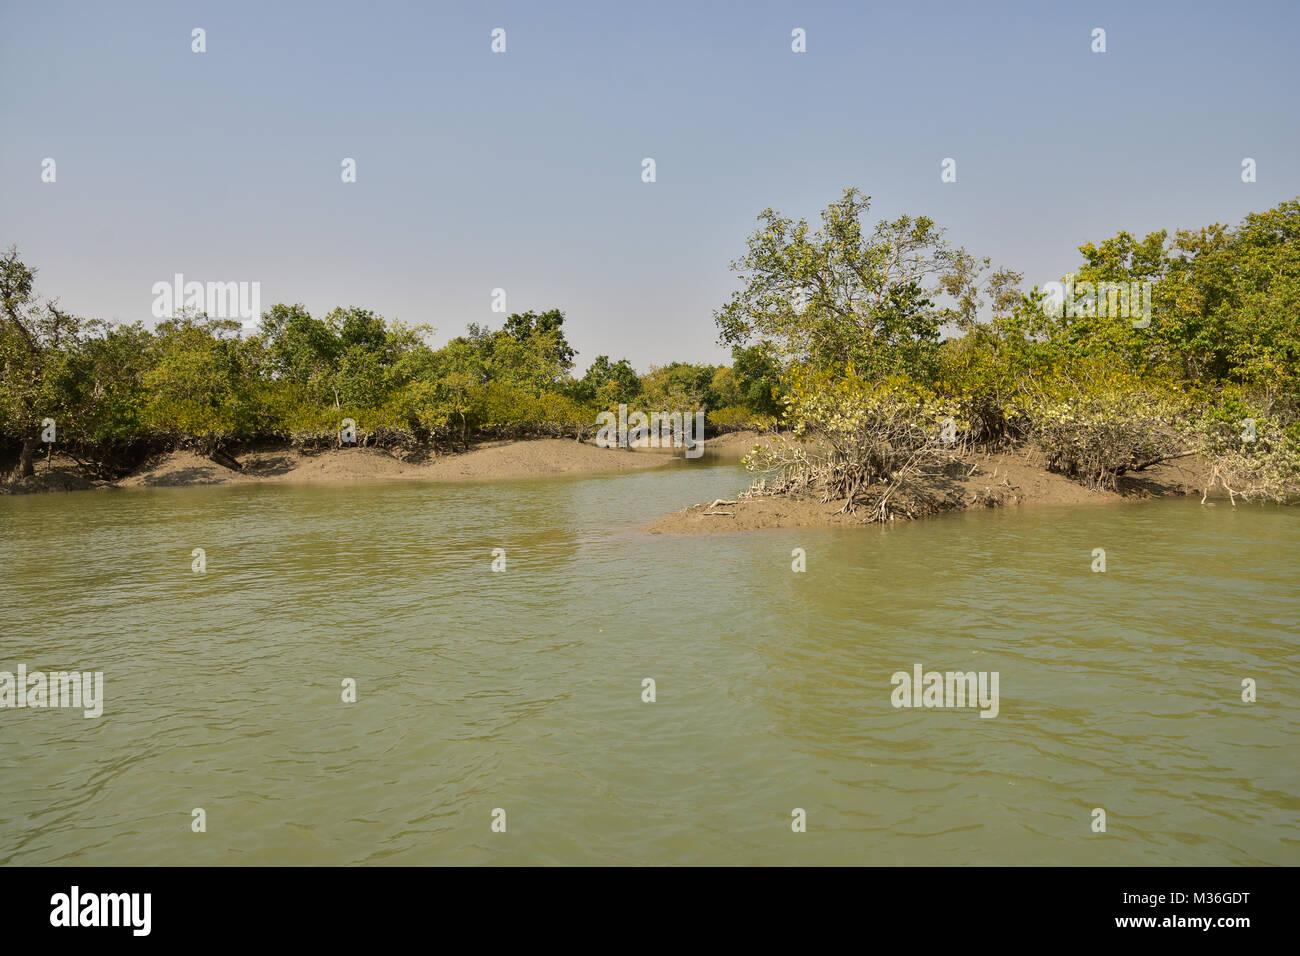 Estuarine landscape and Mangroove forest, Sundarbans delta, West Bengal, India - Stock Image